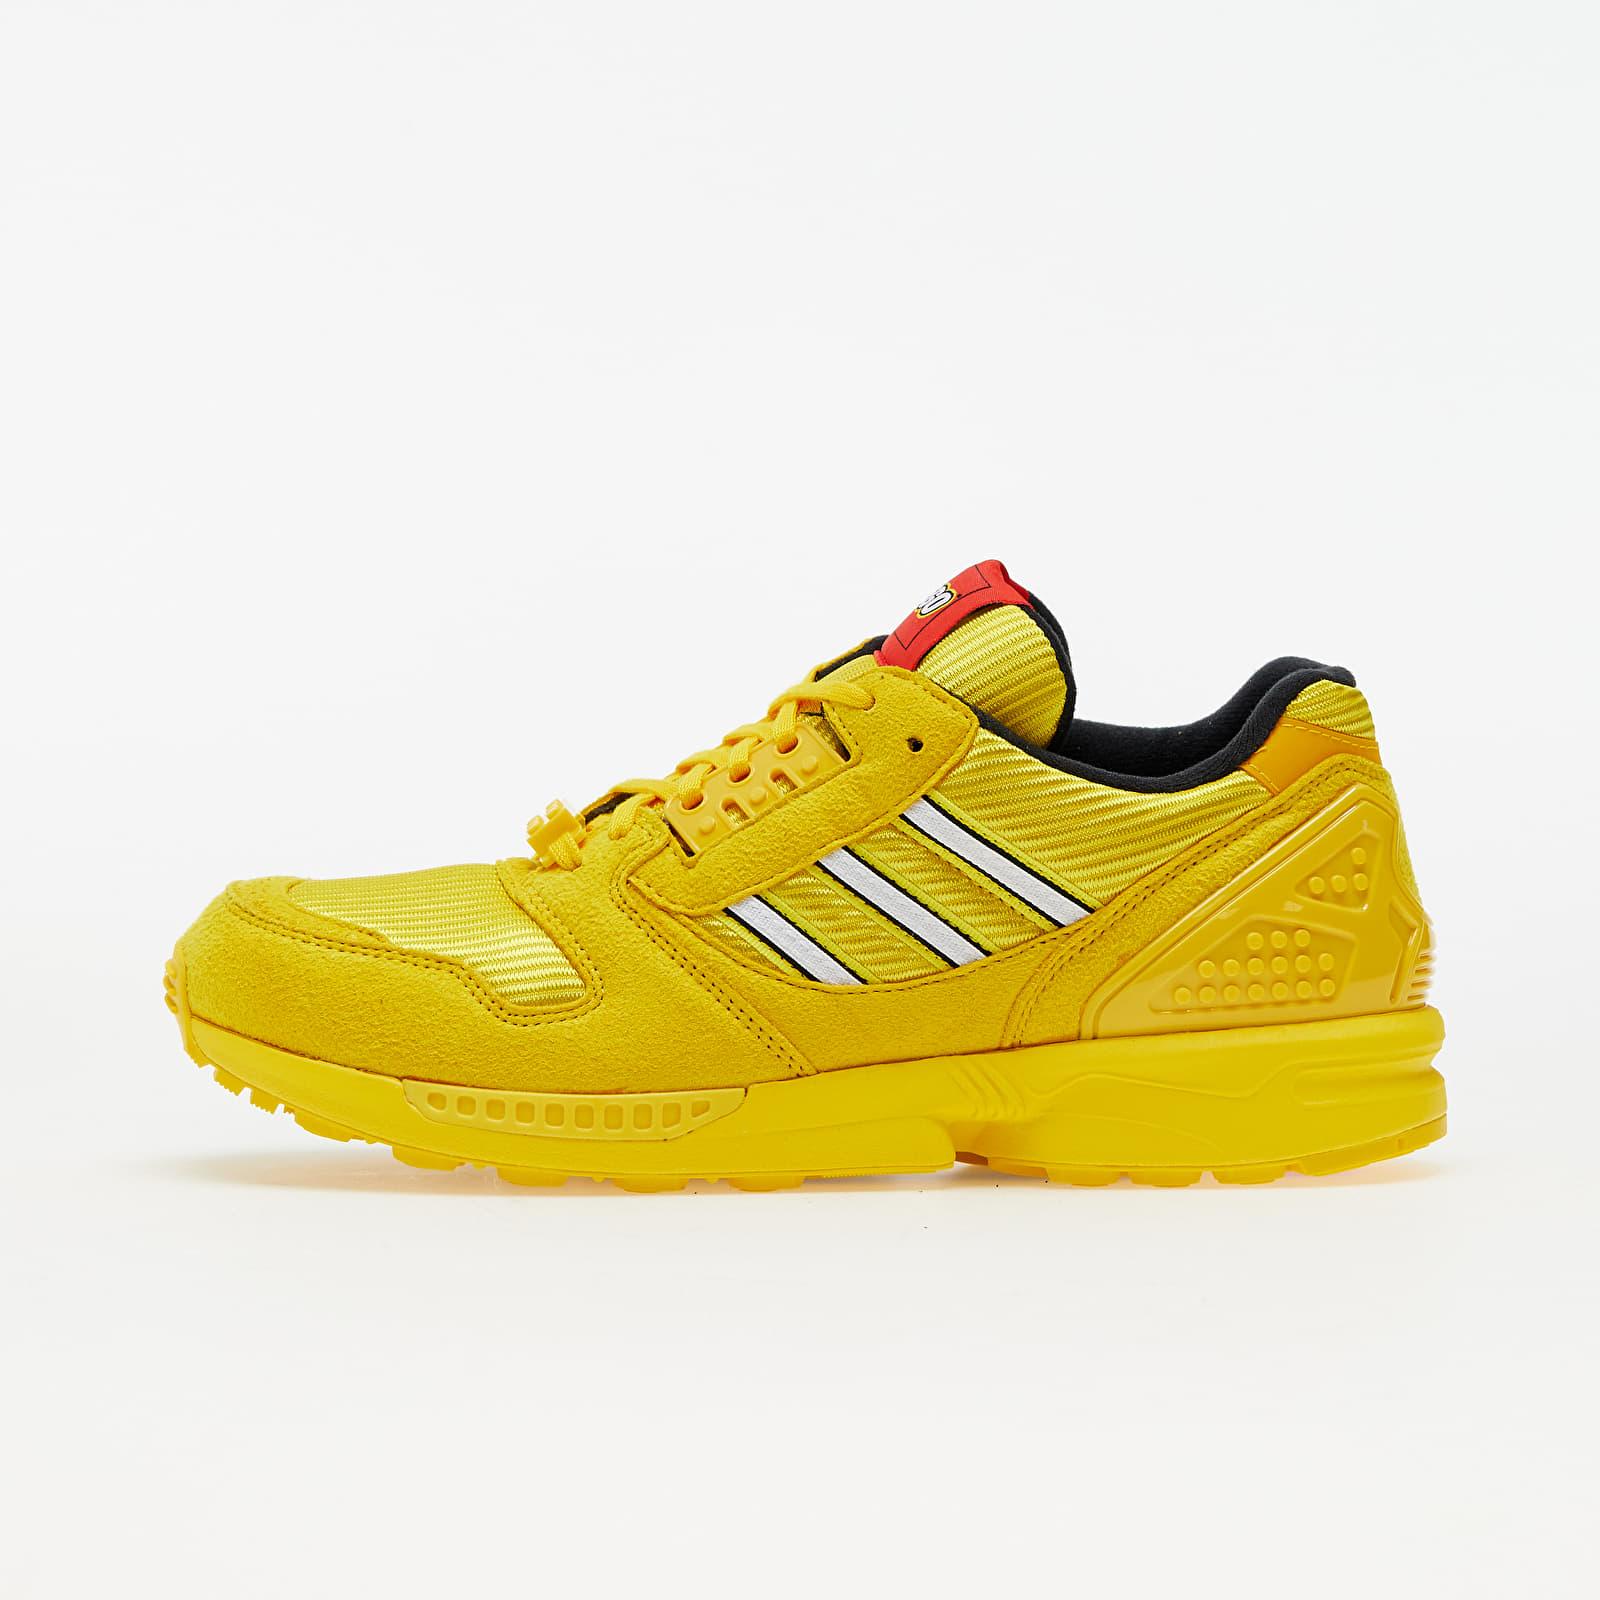 adidas ZX 8000 Lego EQT Yellow/ Ftw White/ EQT Yellow EUR 38